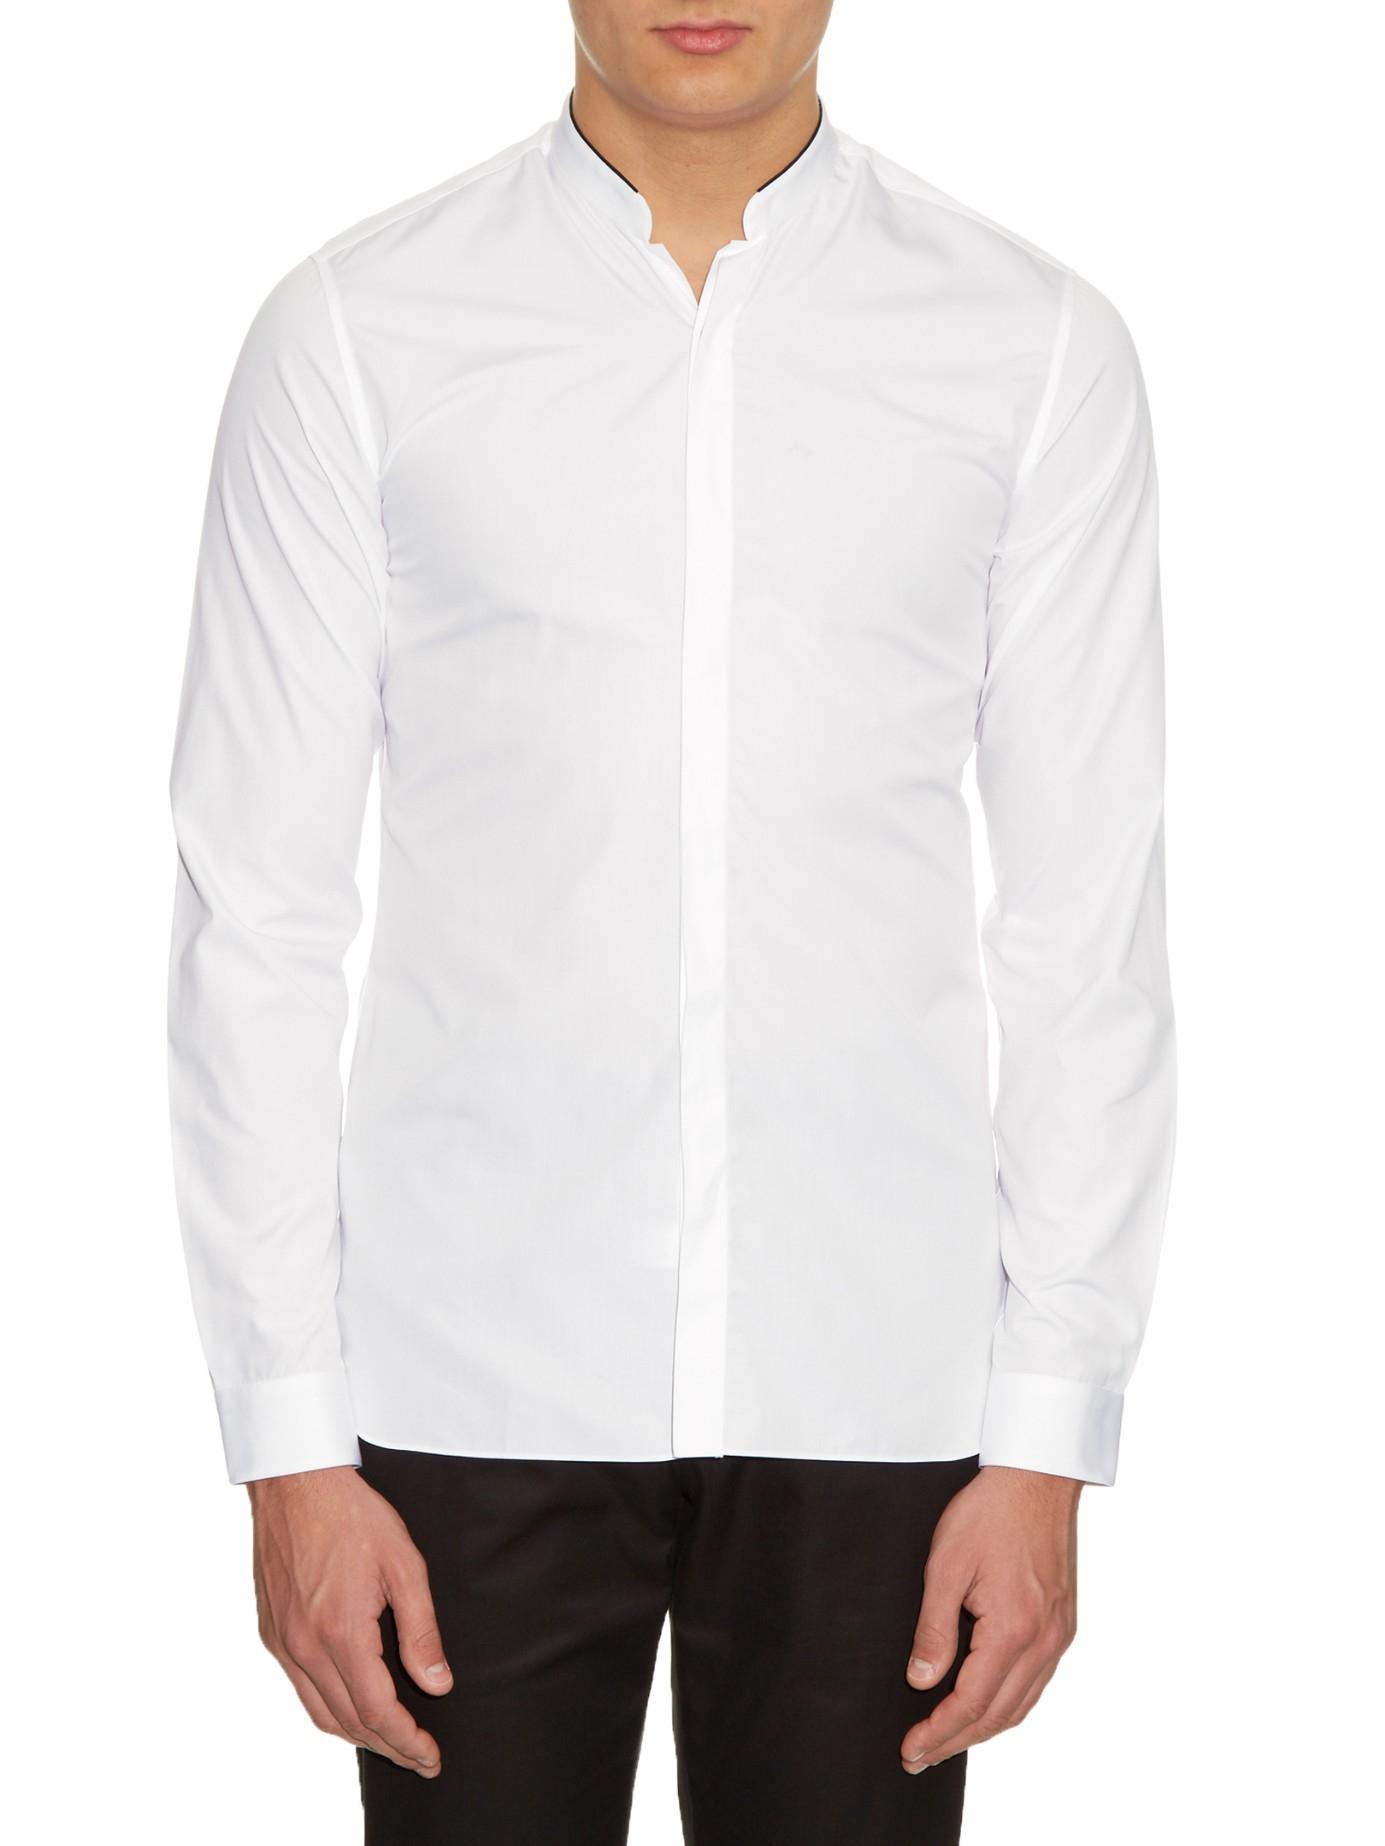 Lanvin mandarin collar button cuff cotton shirt in white for White shirt with collar pin